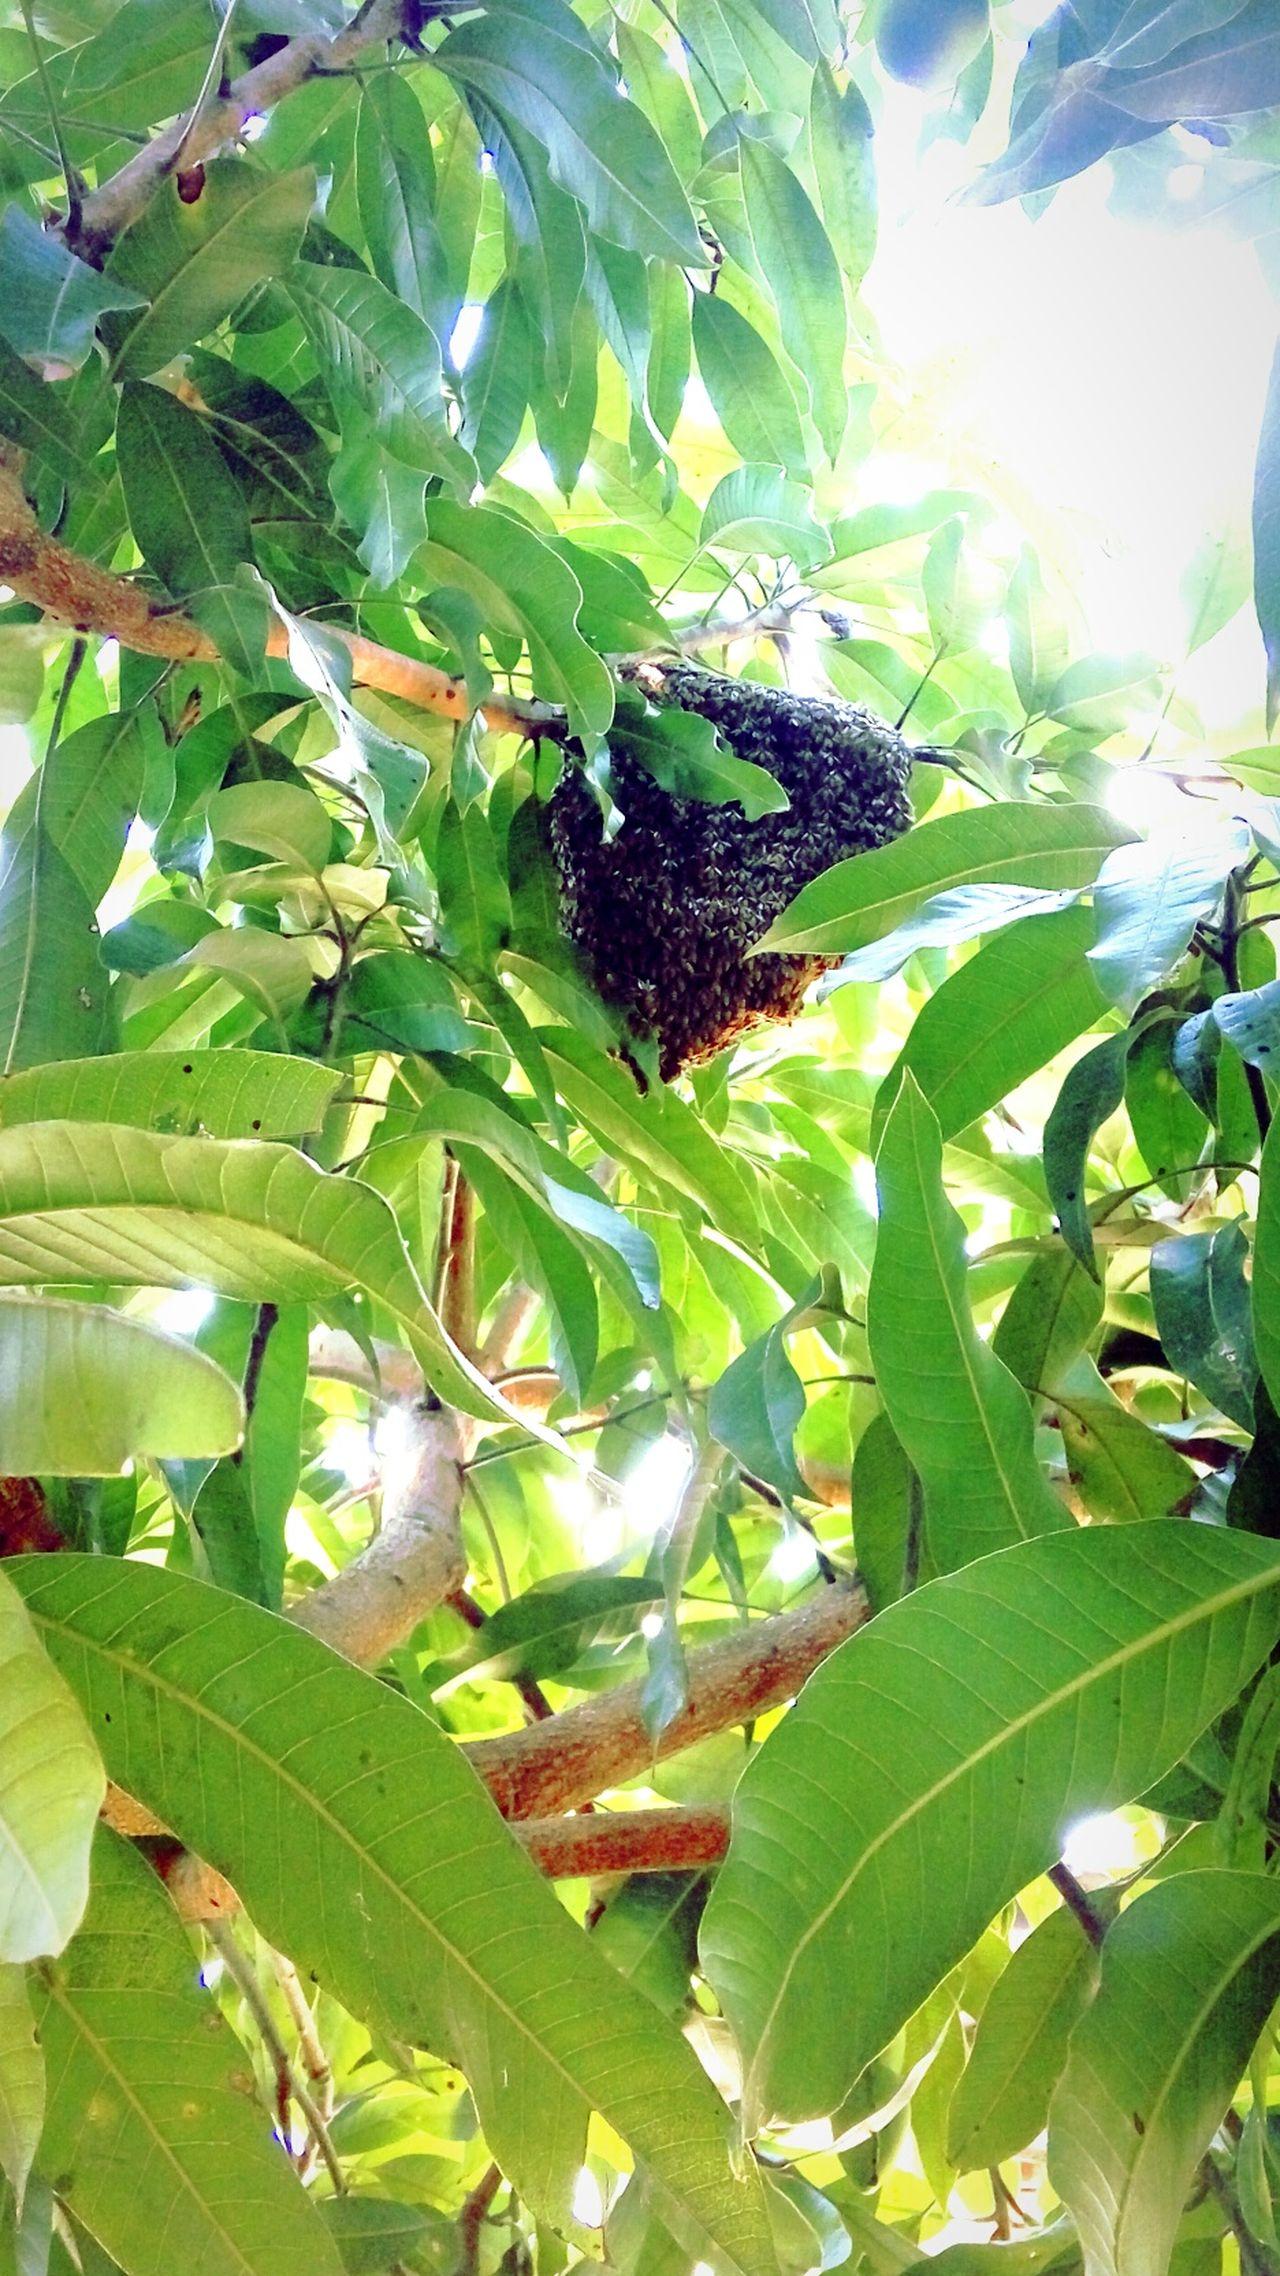 Freshness Animal Themes Leaf Green Color Nature Growth On Mangos Tree Kota Bharu, Malaysia